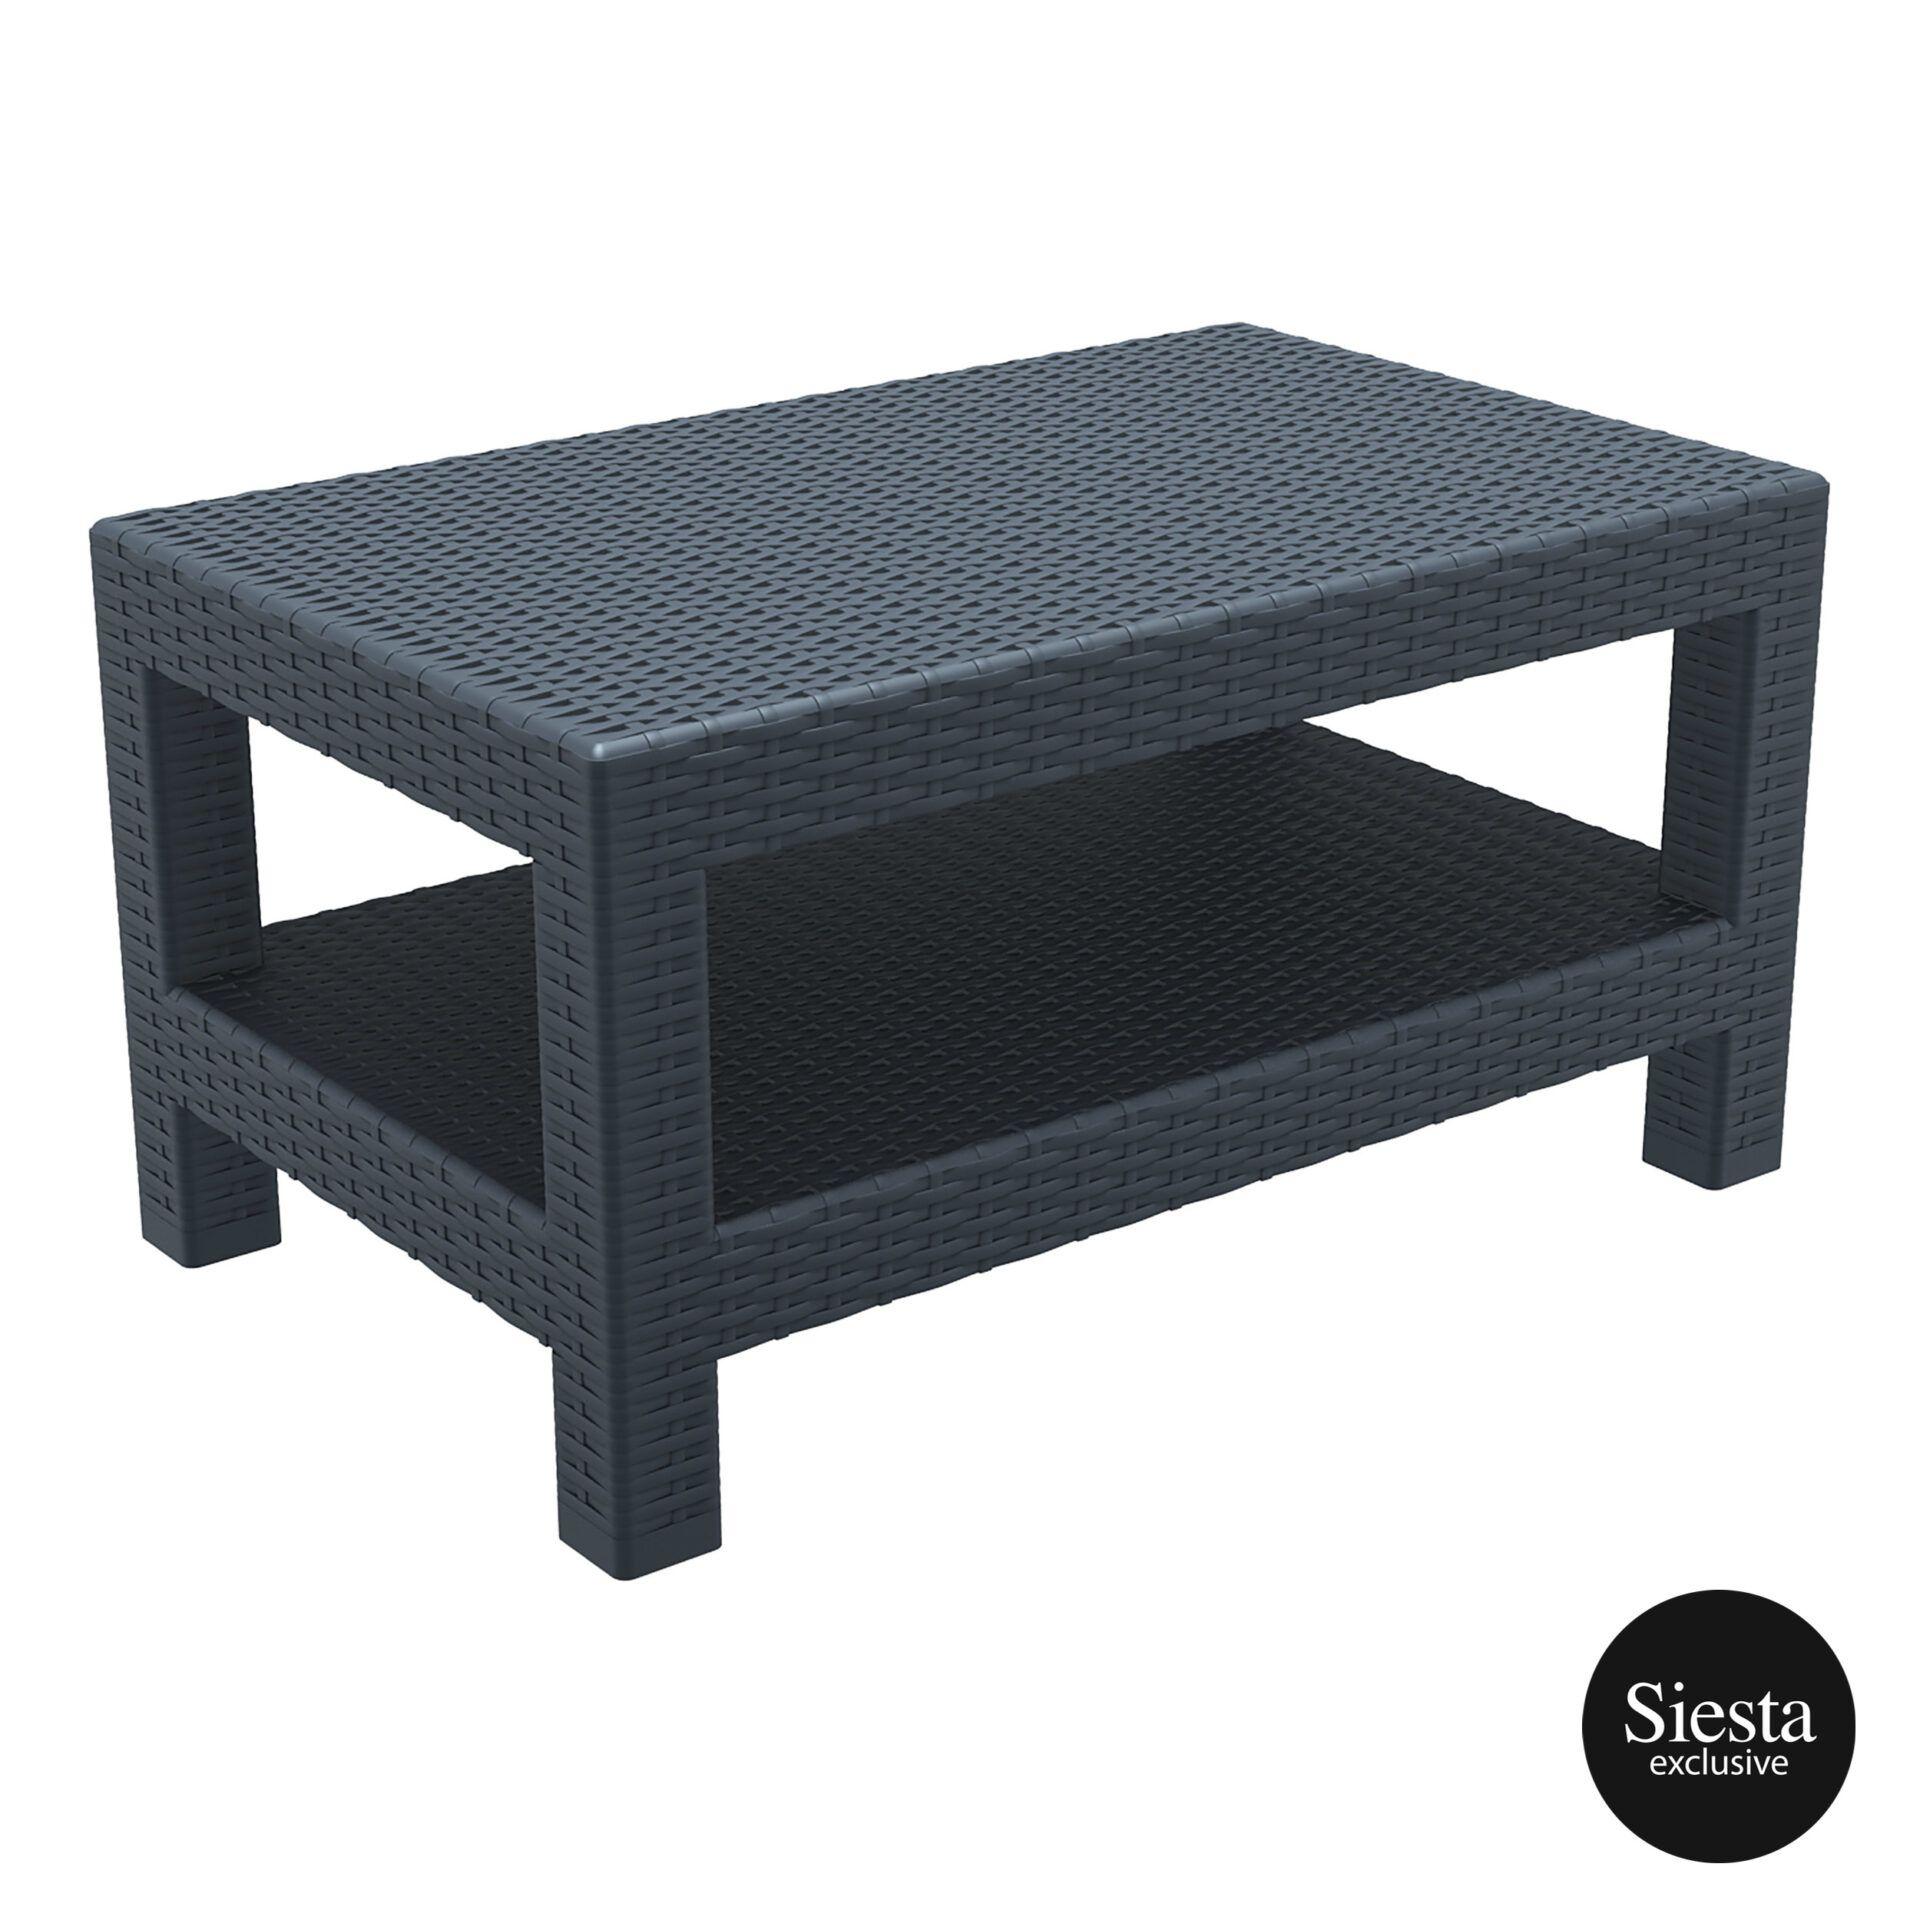 Resin Rattan Monaco Lounge Table darkgrey front side